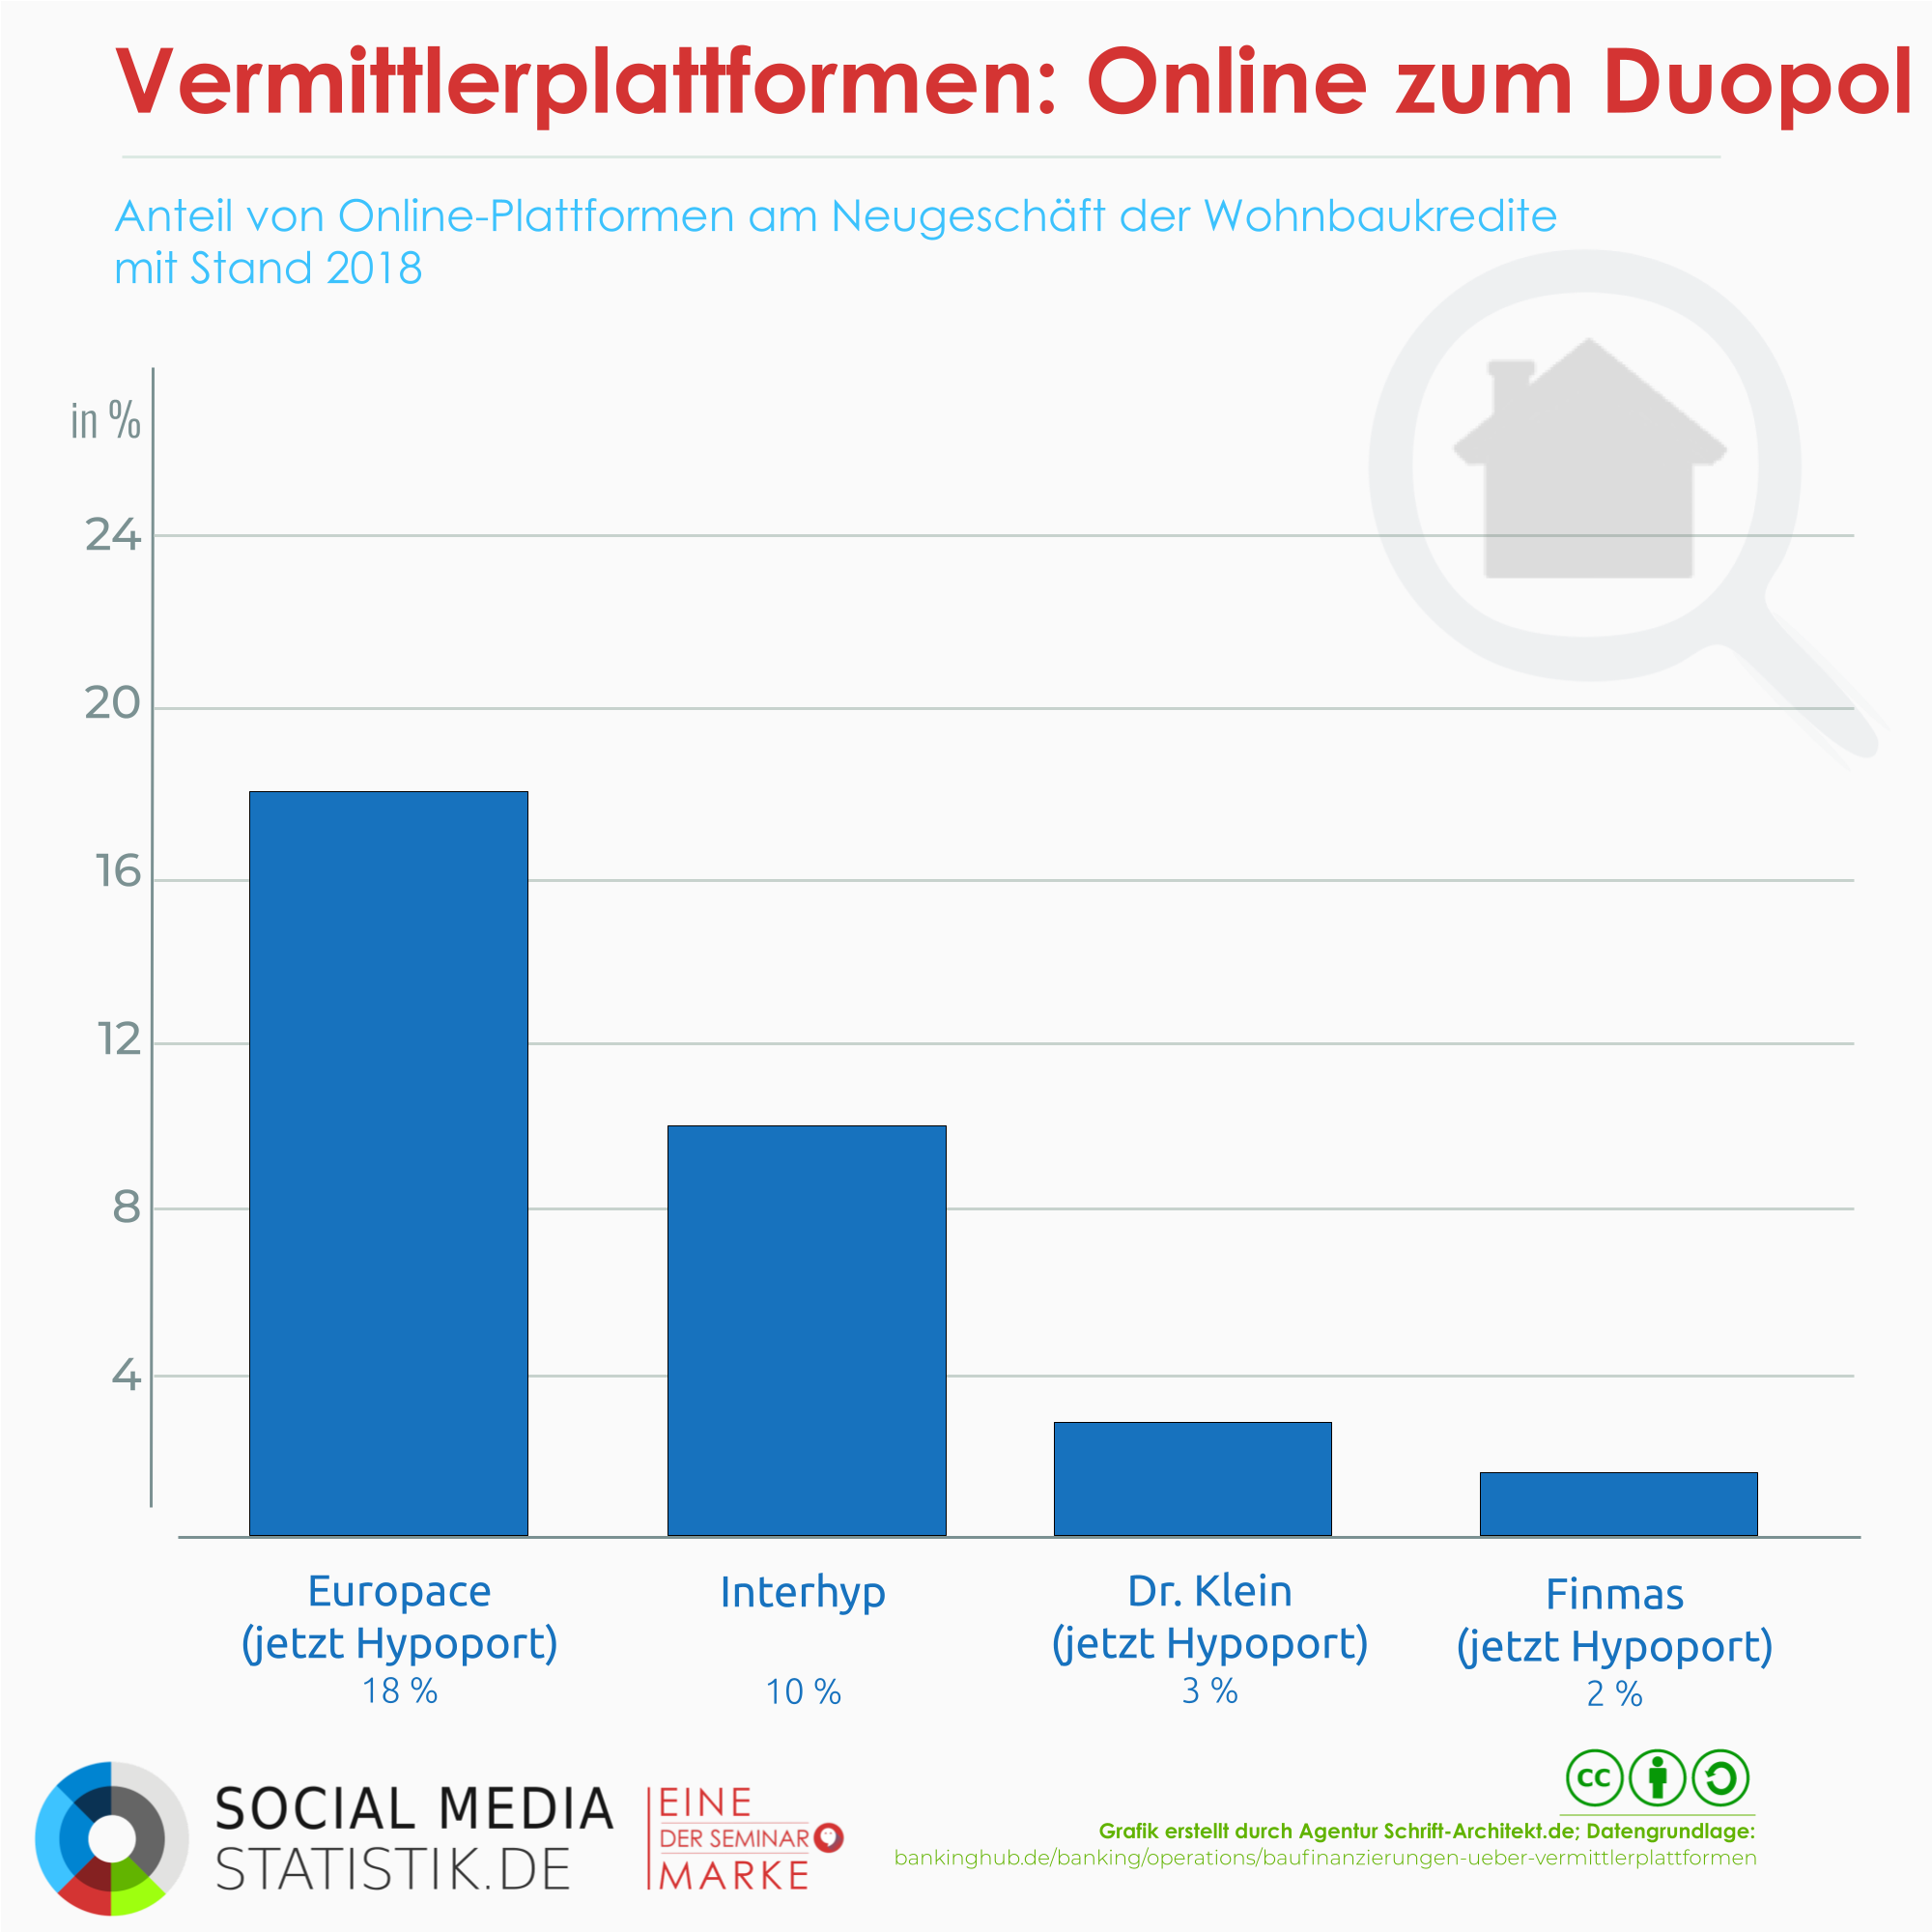 Infografik Social Media Statistik zum Thema online plattformen immobilien